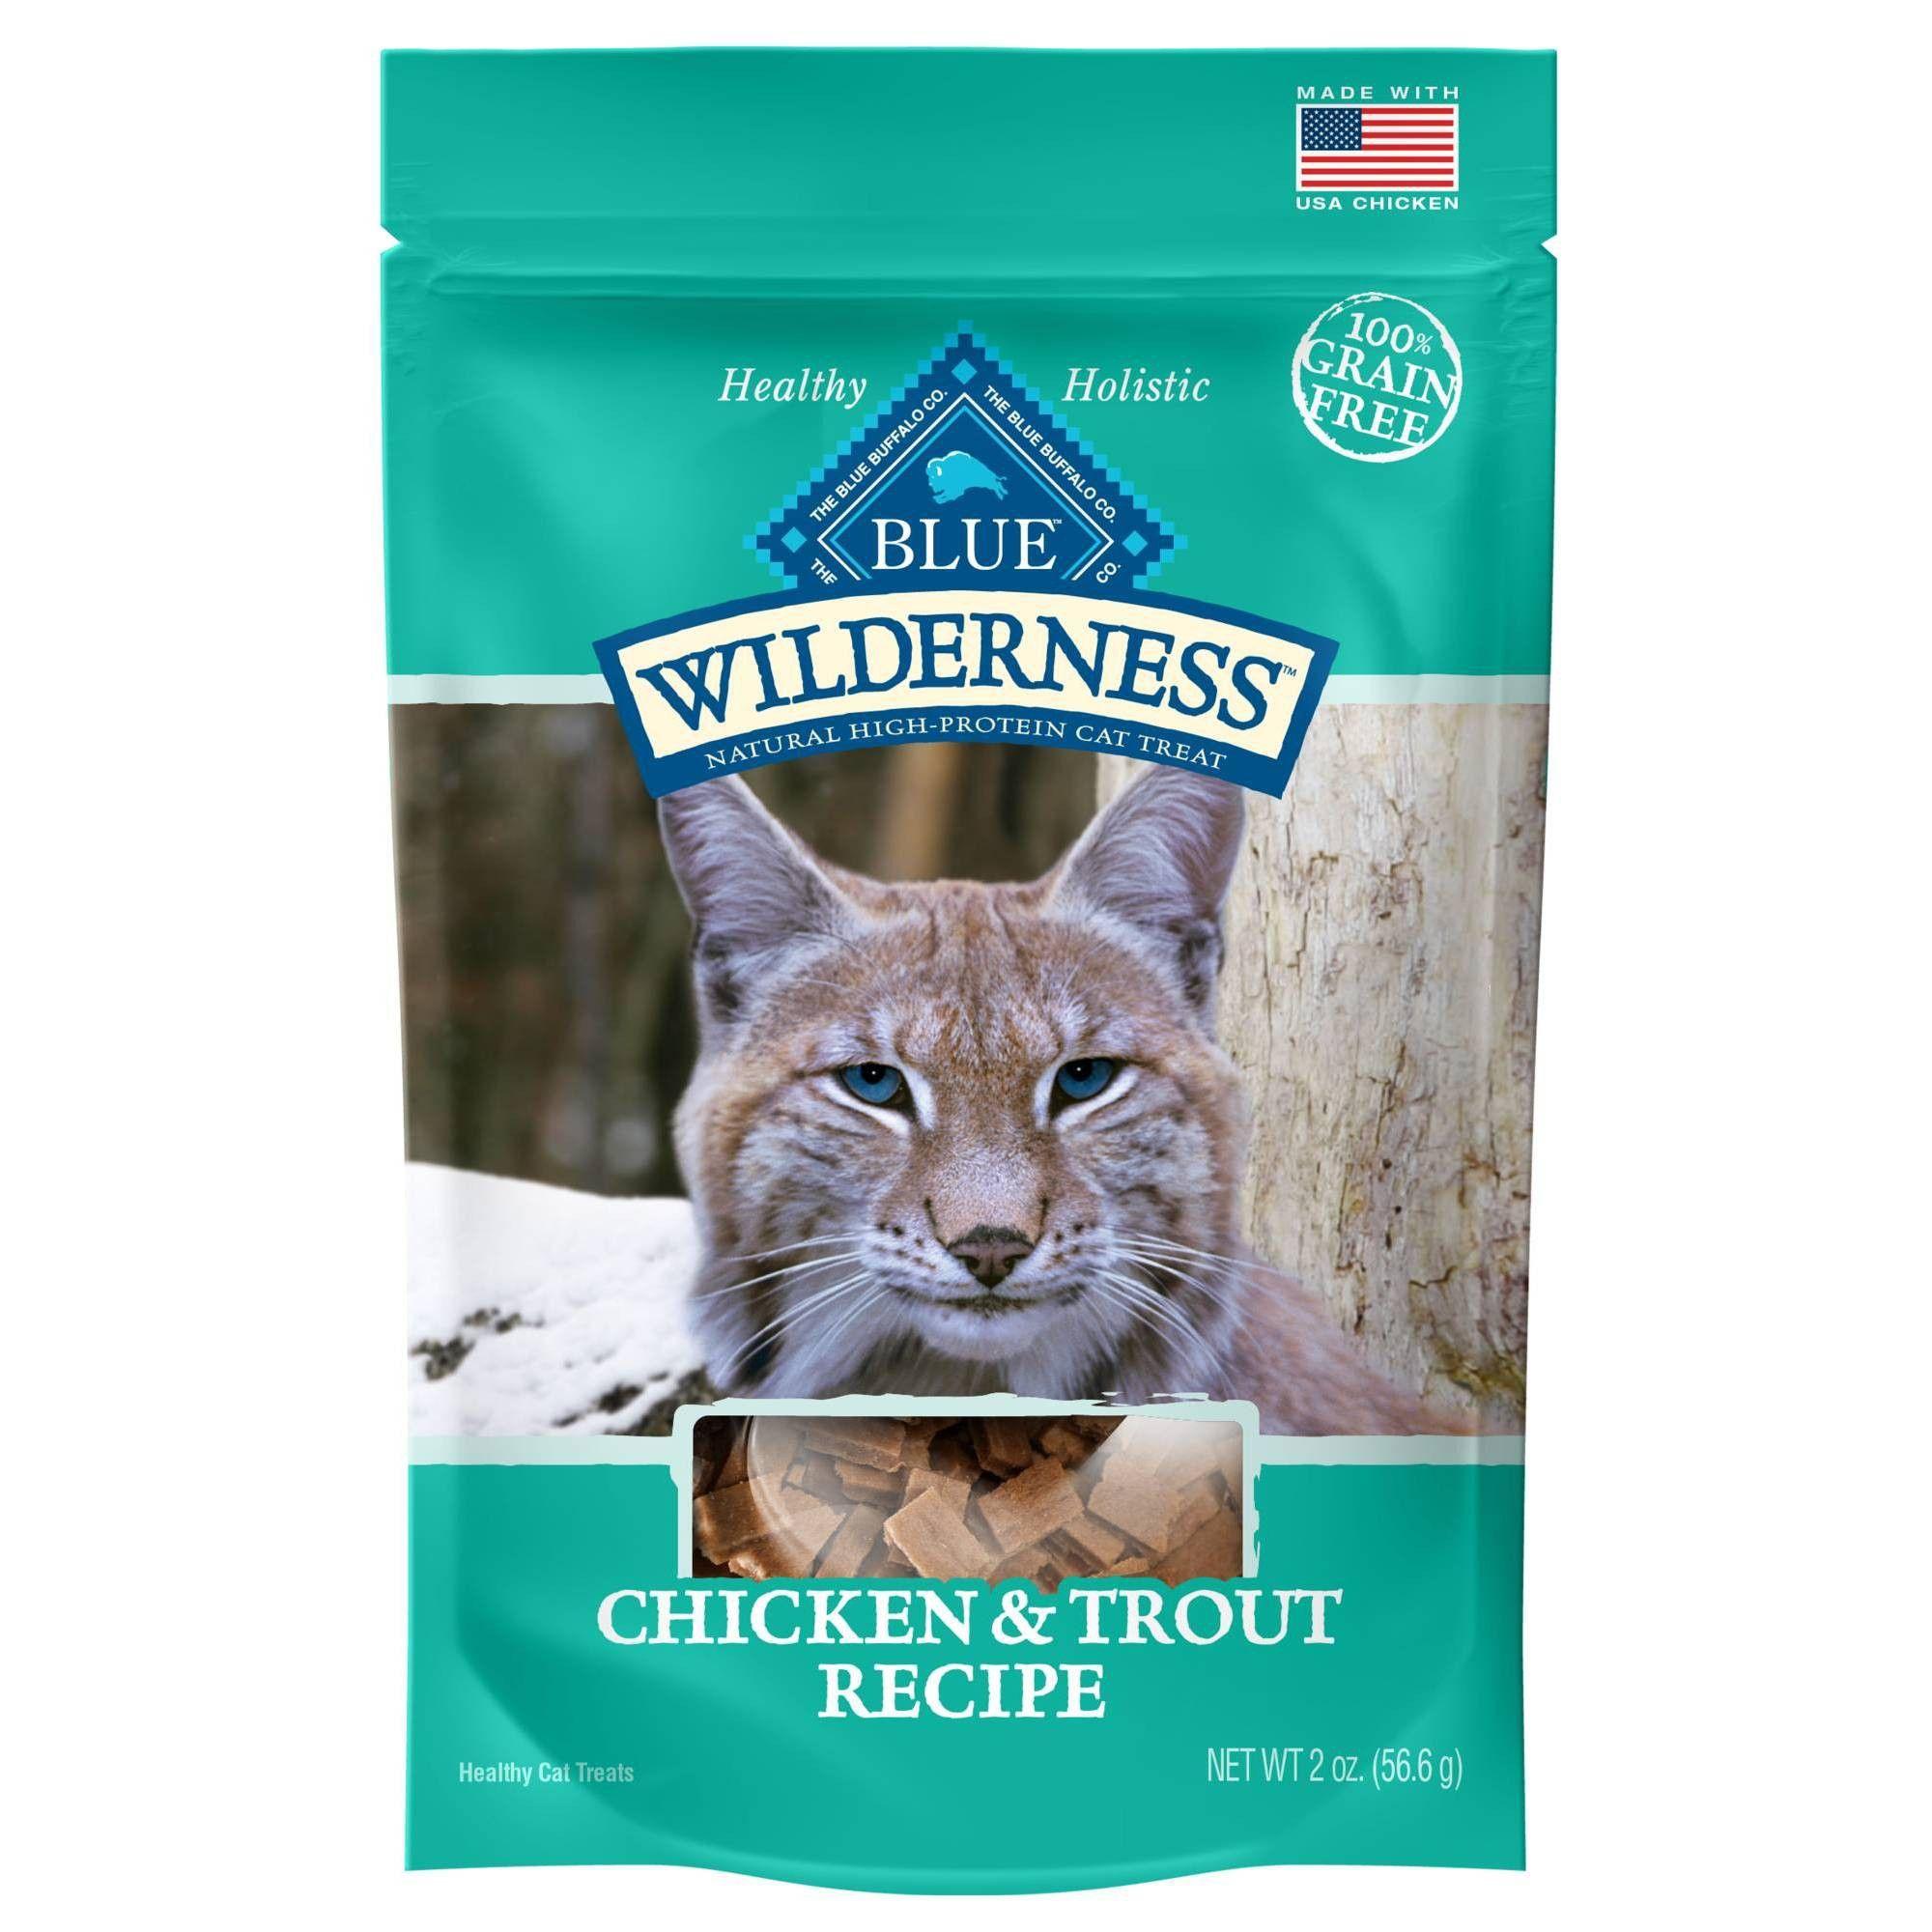 Blue Buffalo Wilderness Grain Free Chicken Trout Recipe Crunchy Cat Treats 2oz In 2020 Blue Buffalo Free Cats Food Animals